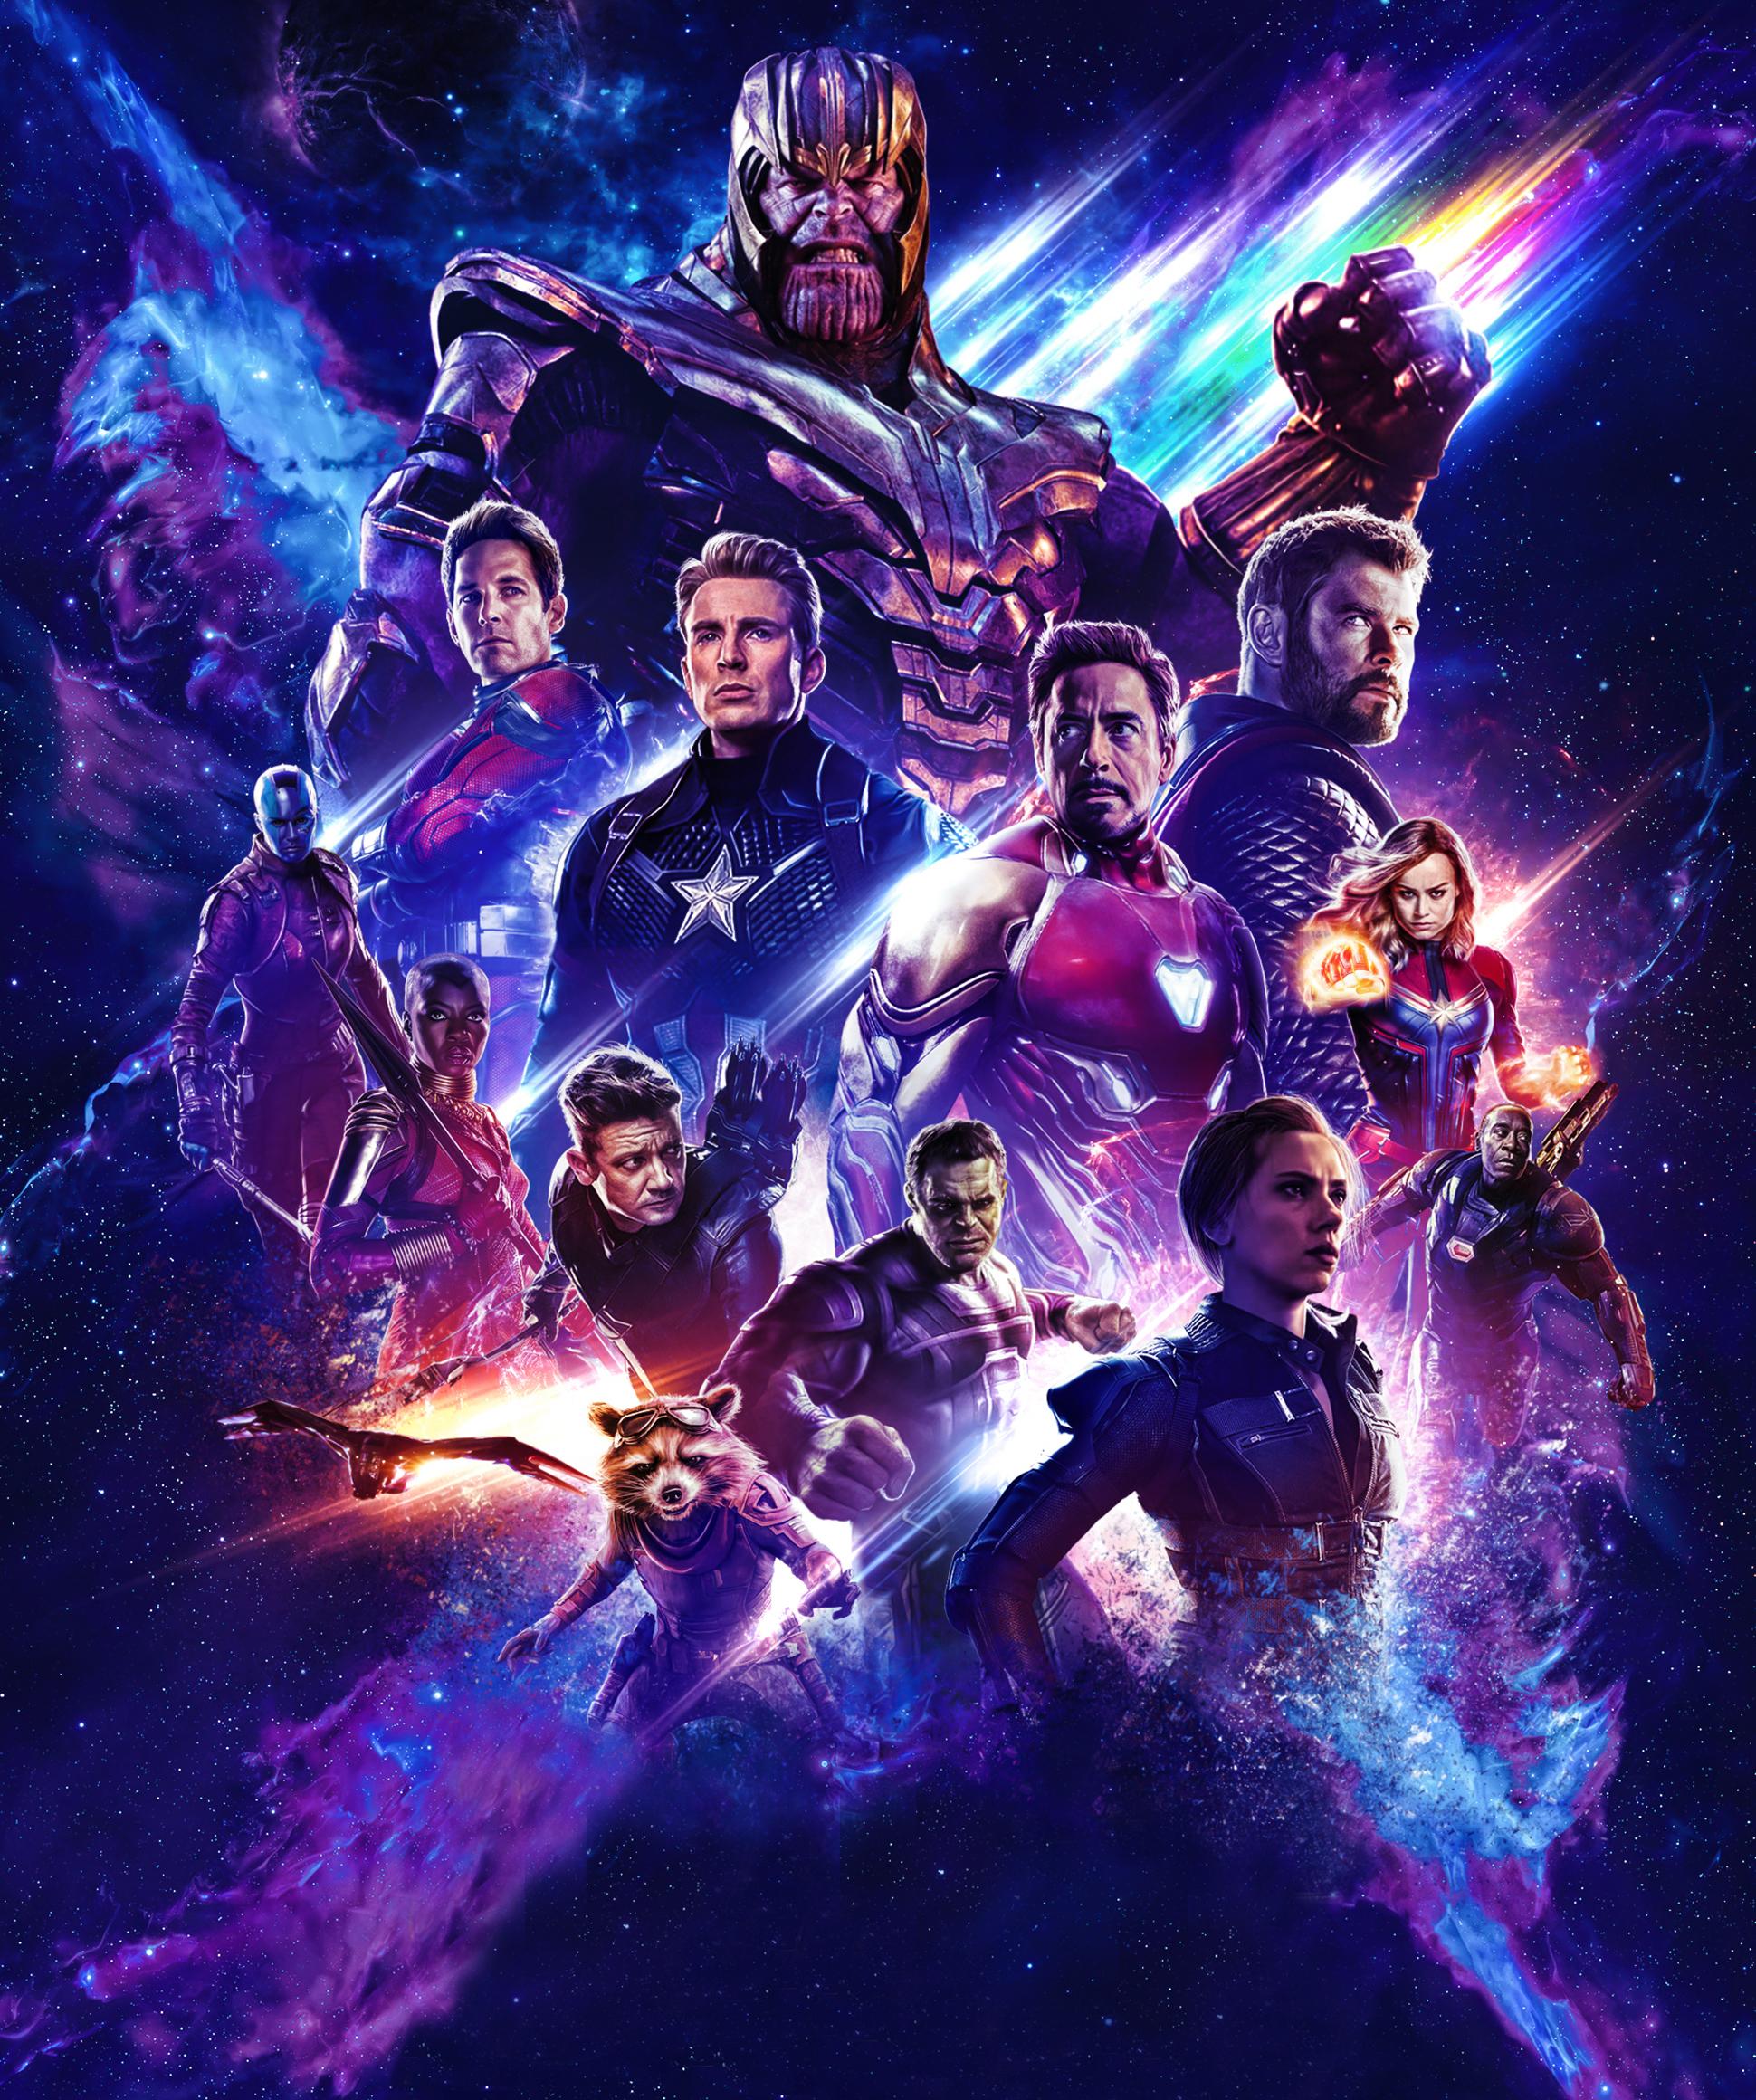 1024x600 Avengers Endgame 2019 Movie 1024x600 Resolution